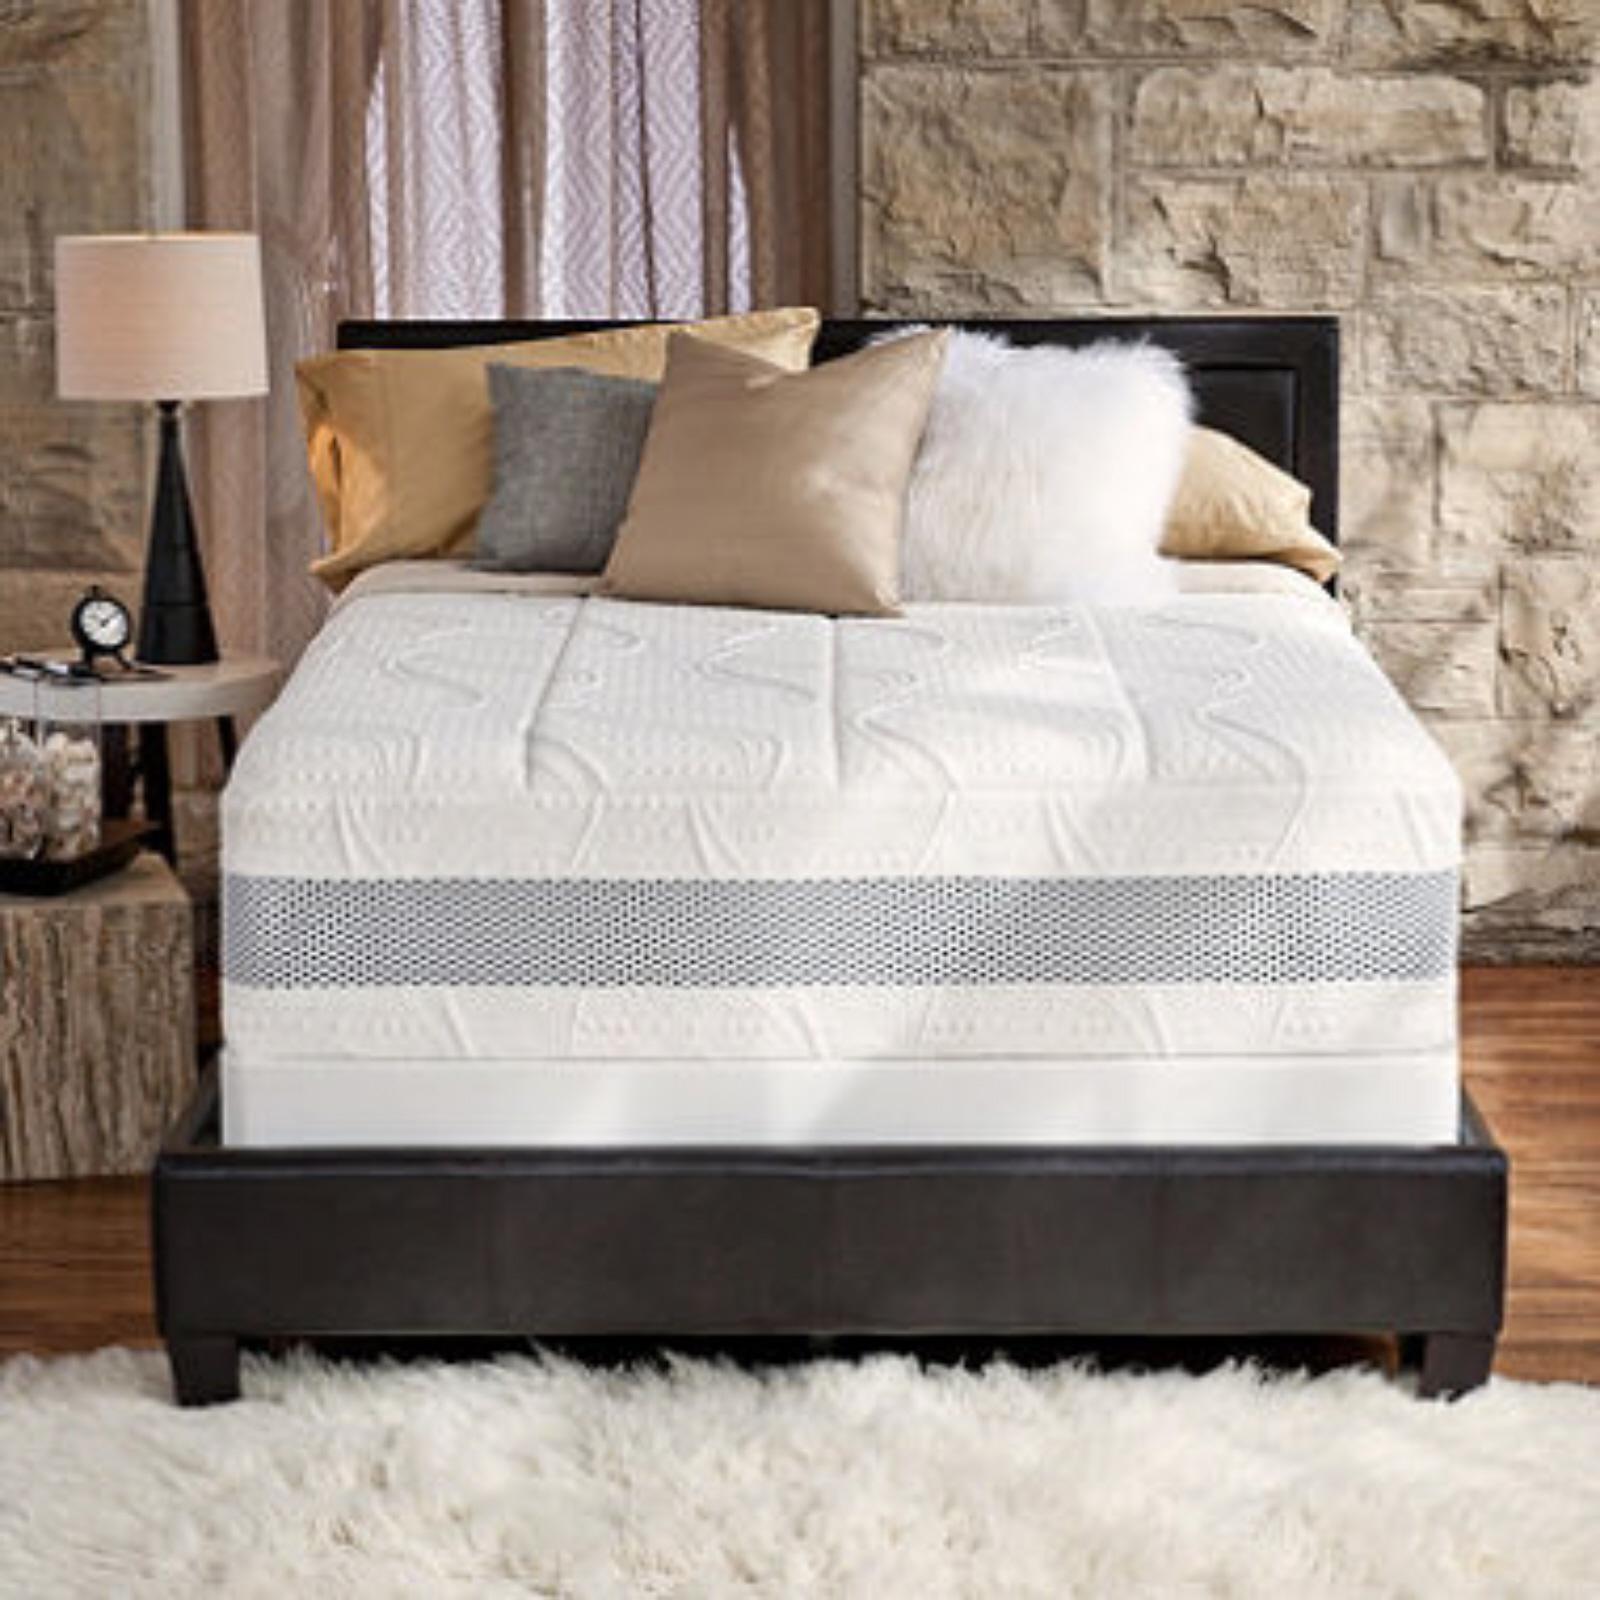 14 night therapy deluxe grand memory foam mattress bi fold box spring set new mattresses Memory foam mattress set